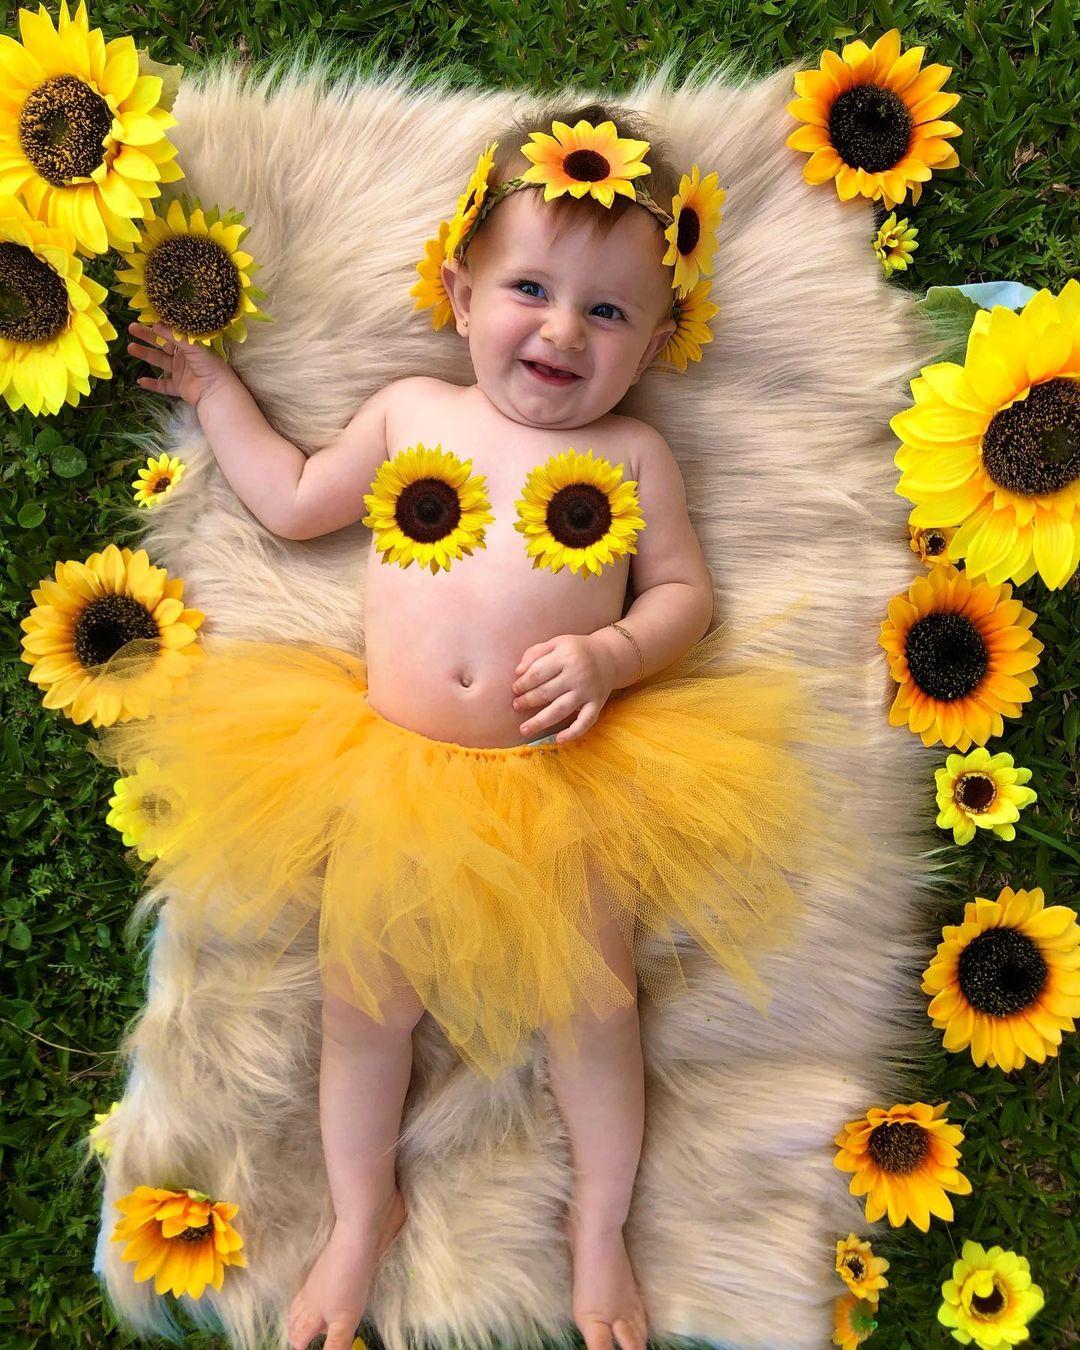 foto de bebe com flores